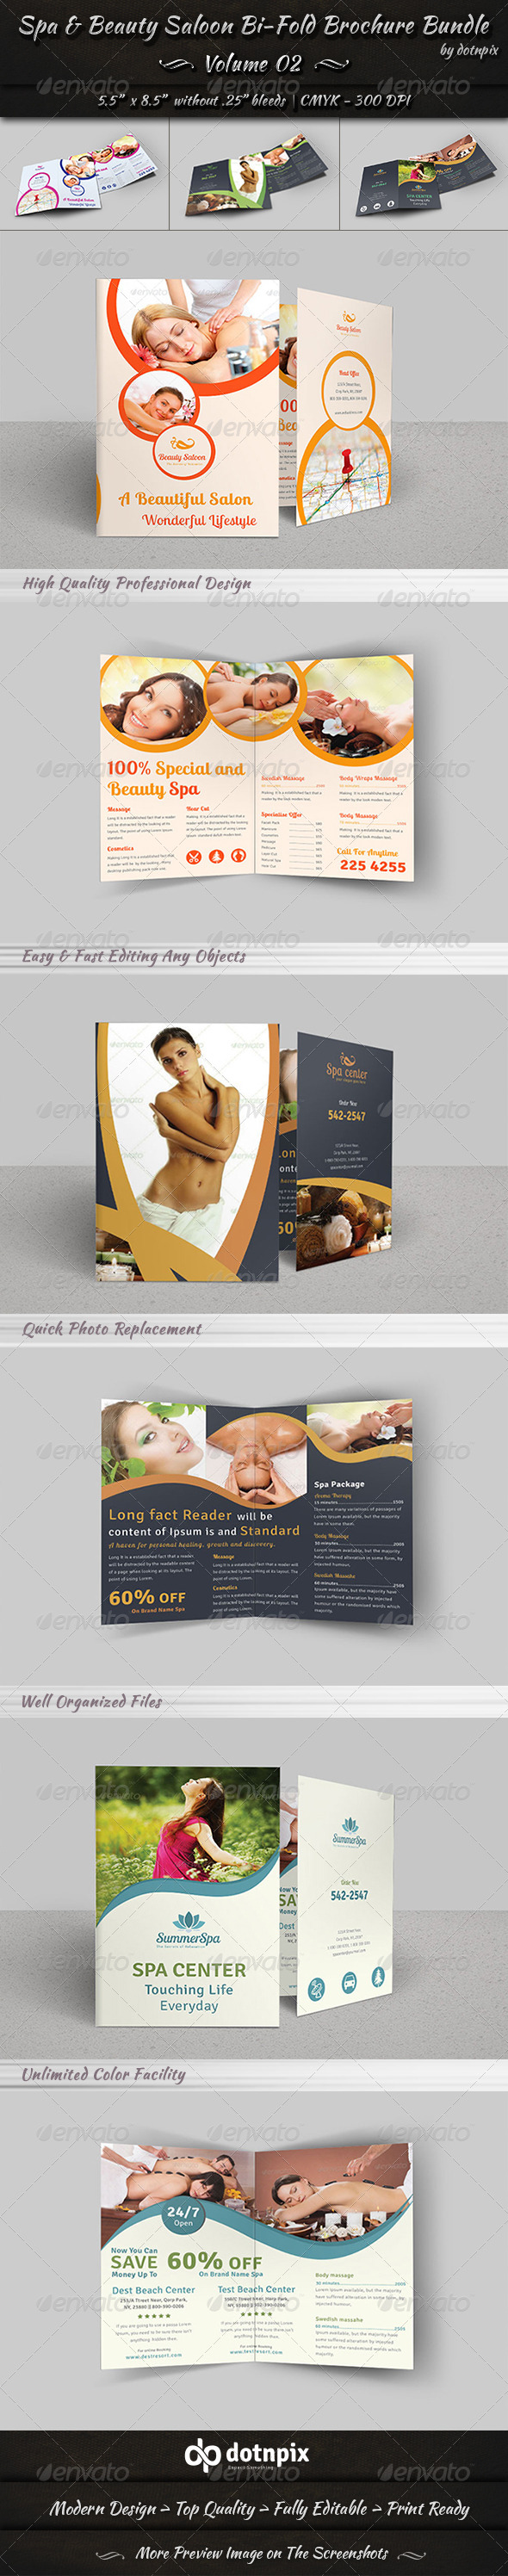 GraphicRiver Spa & Beauty Saloon Bi-Fold Brochure Bundle v2 8172316